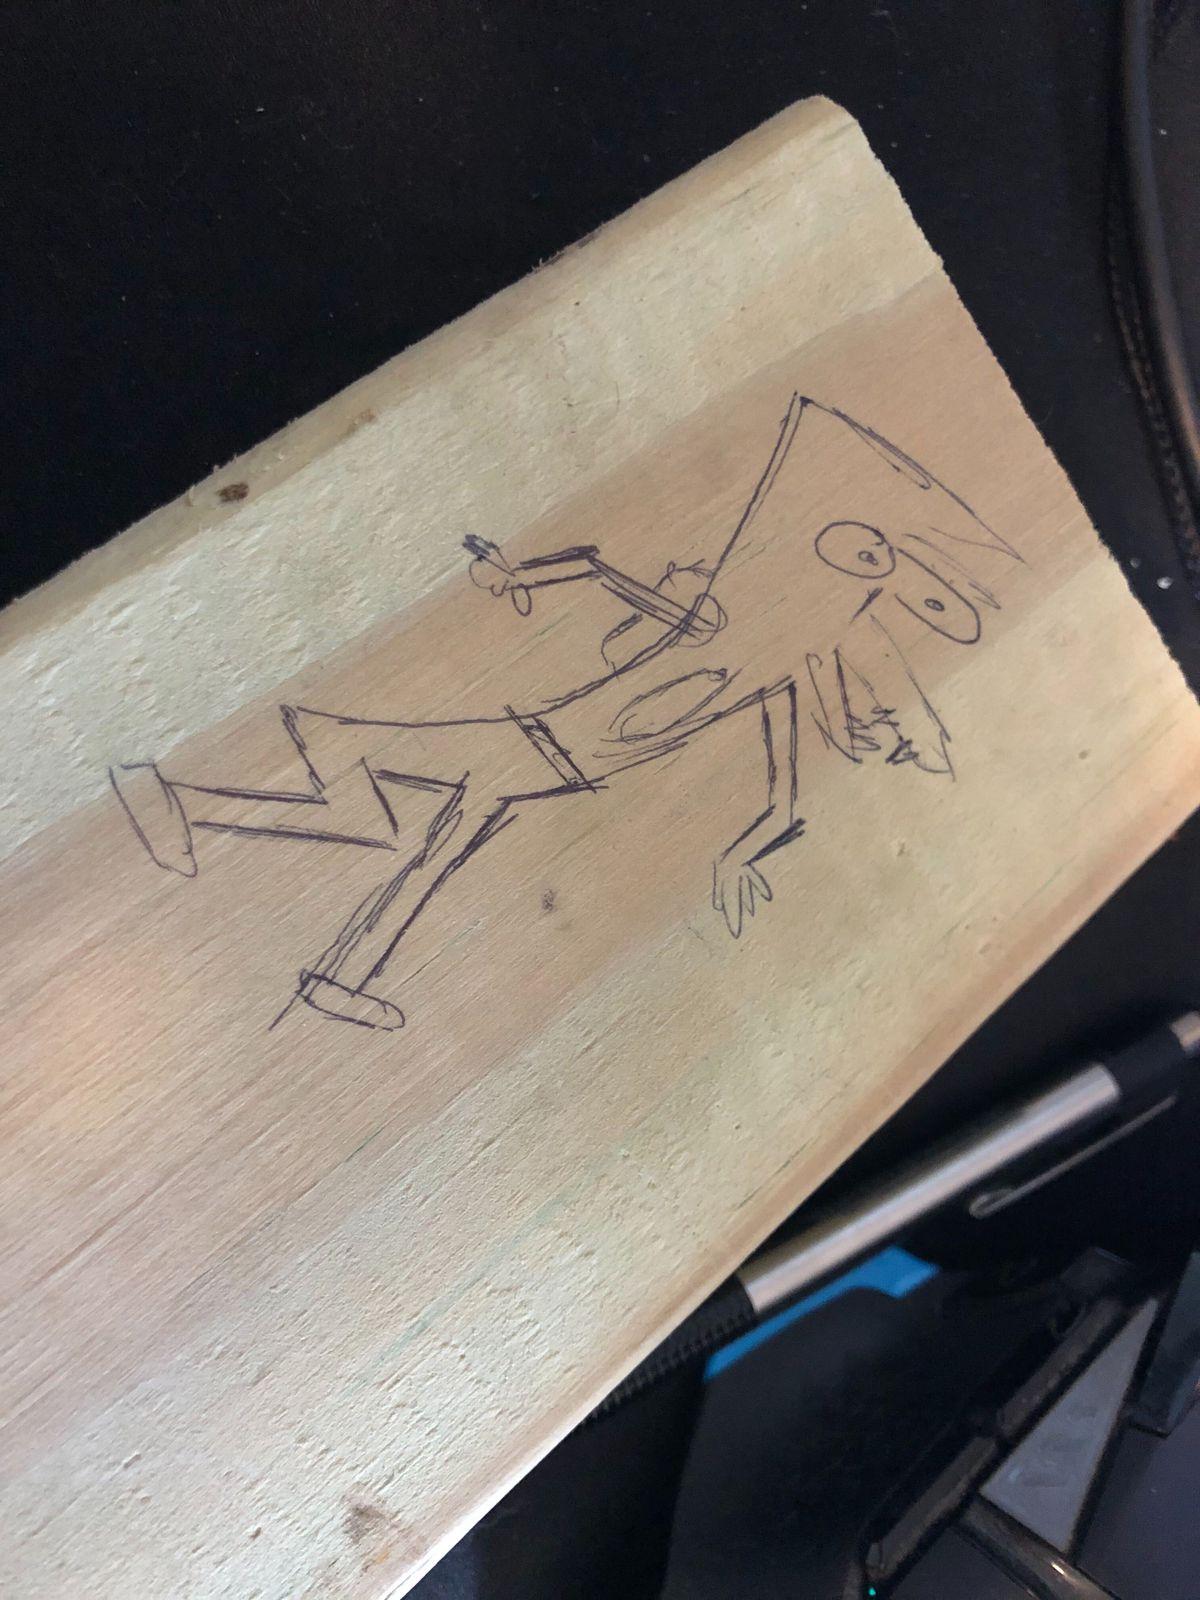 Polygon tries to draw Crash Bandicoot from memory 3